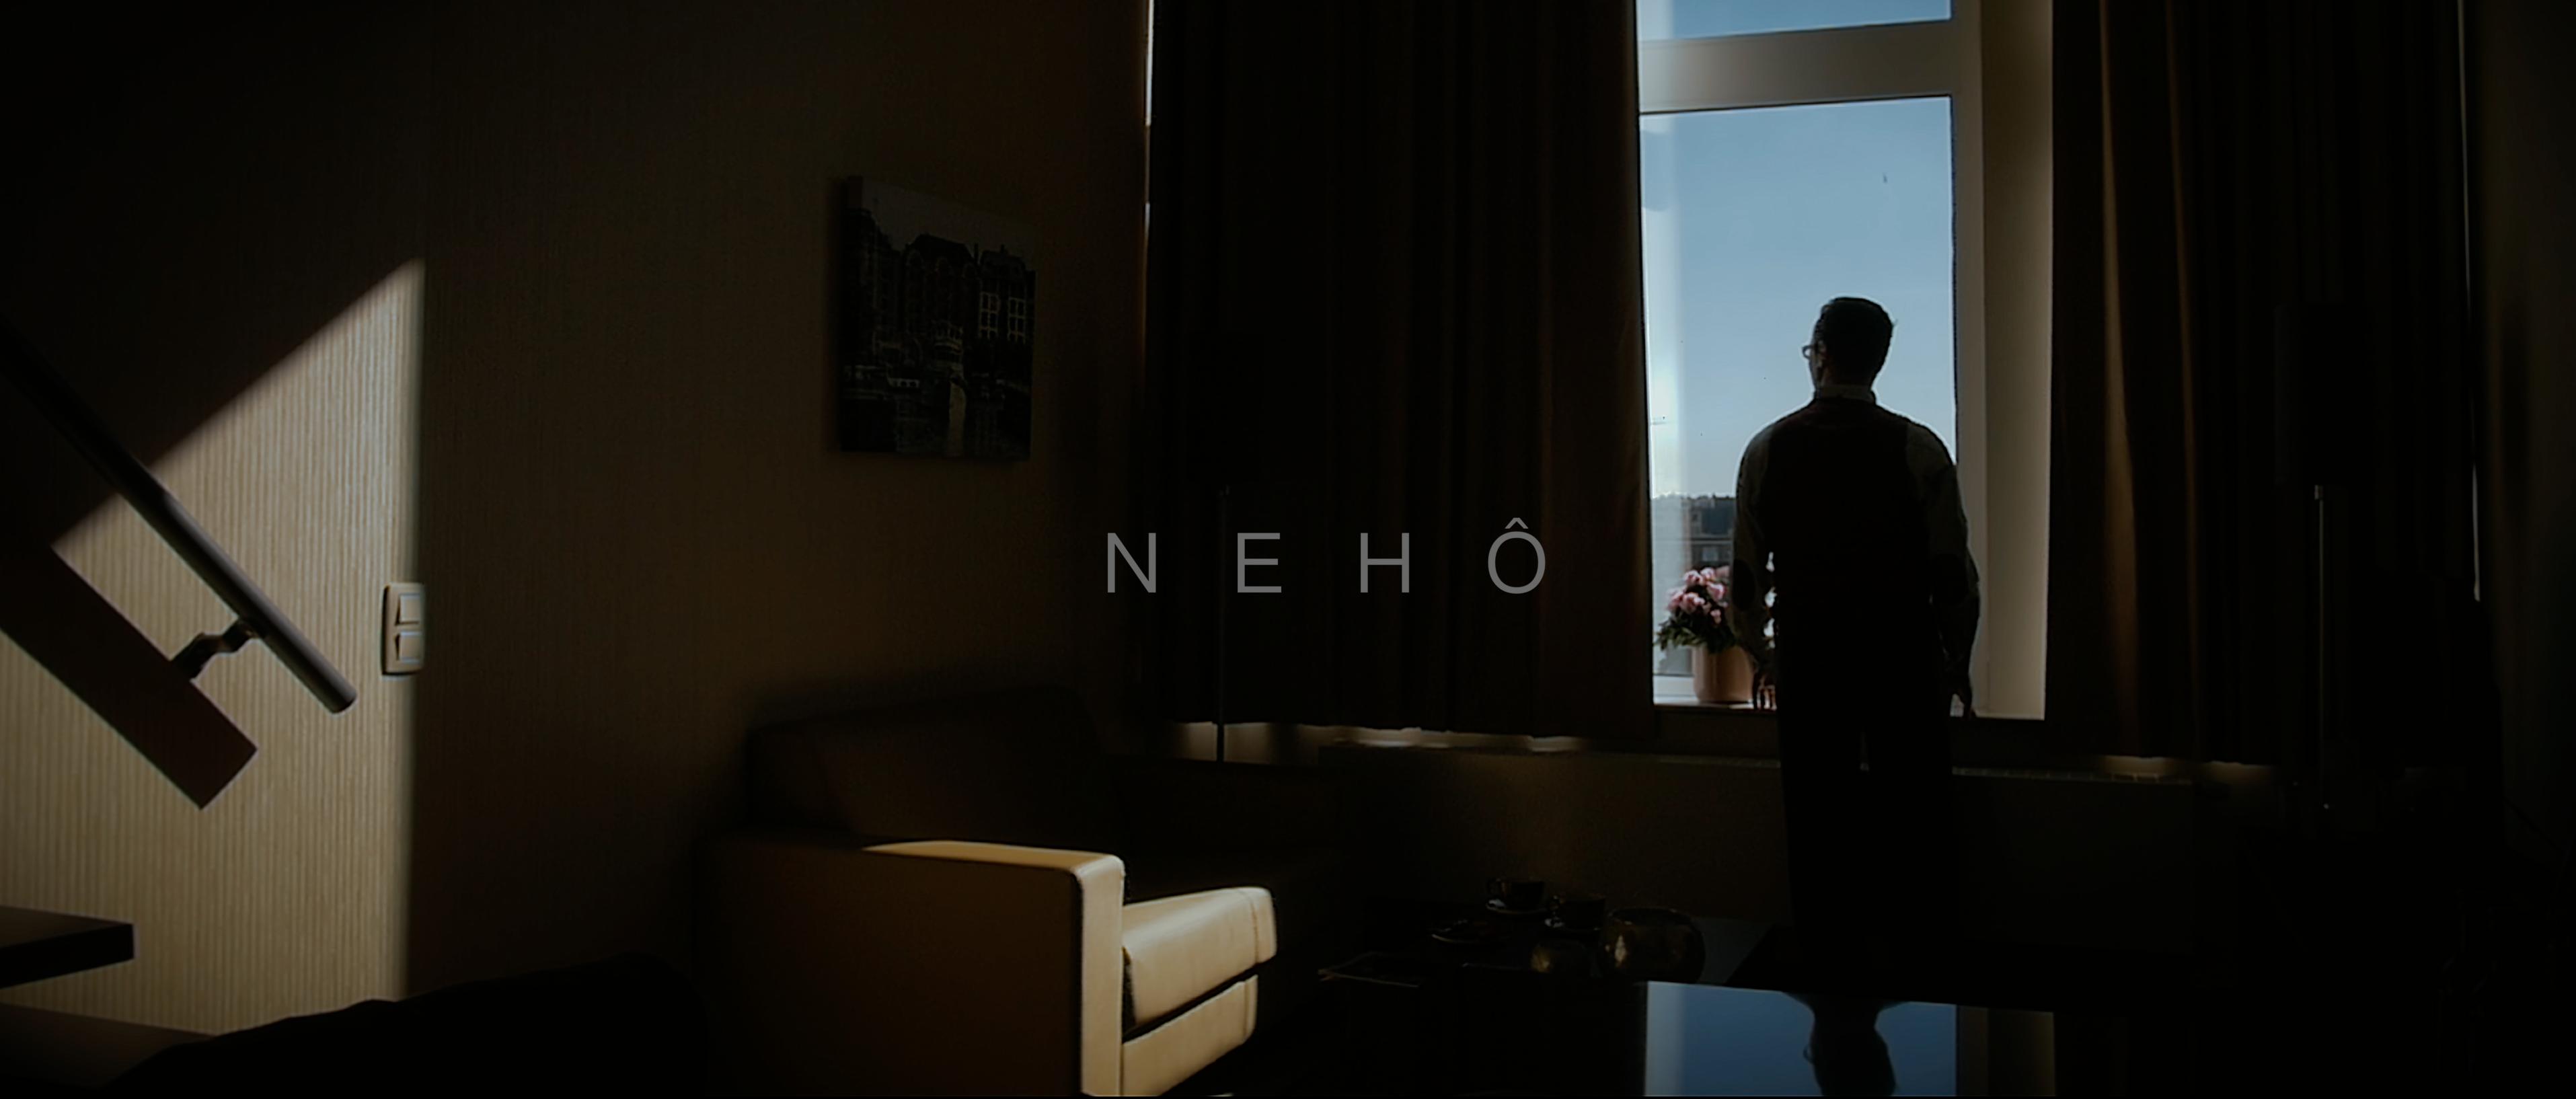 NEHÔ – CORPORATE TEASER